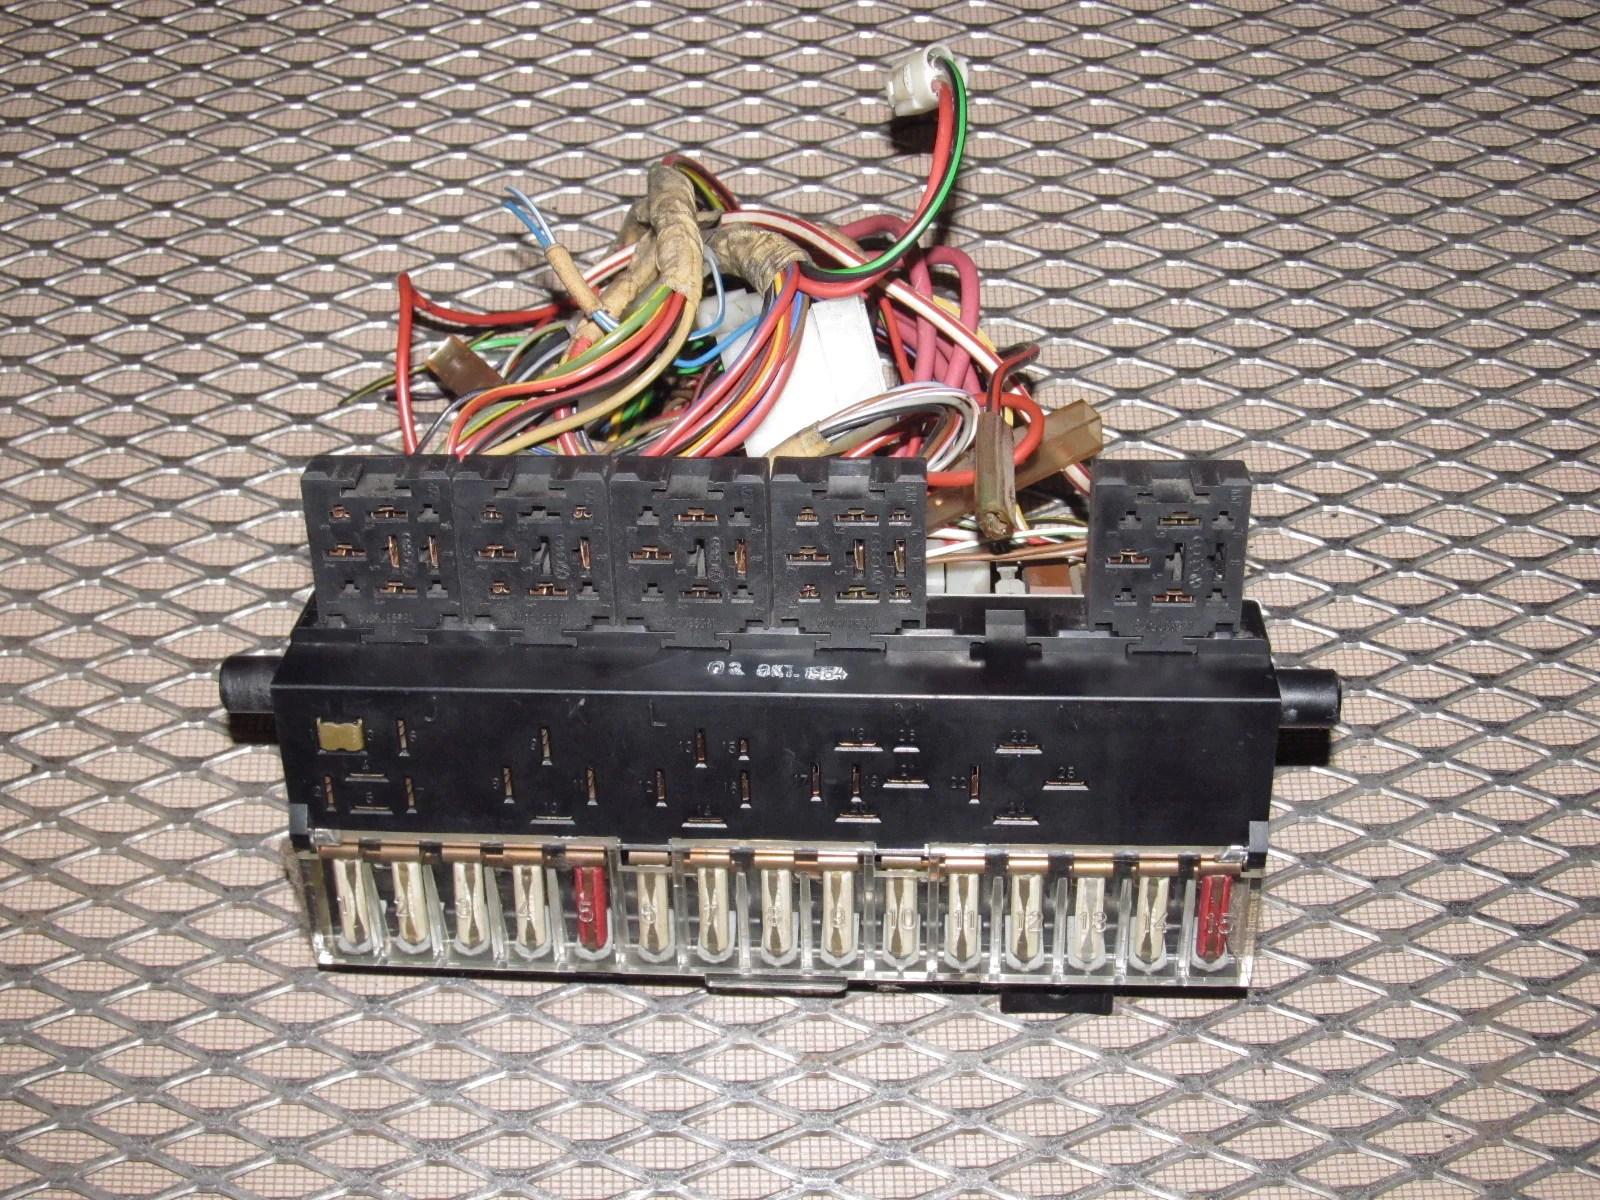 1983 porsche 944 radio wiring diagram solar pv generation meter 1985 fuse box geen ortholinc de 83 85 oem interior autopartone com rh